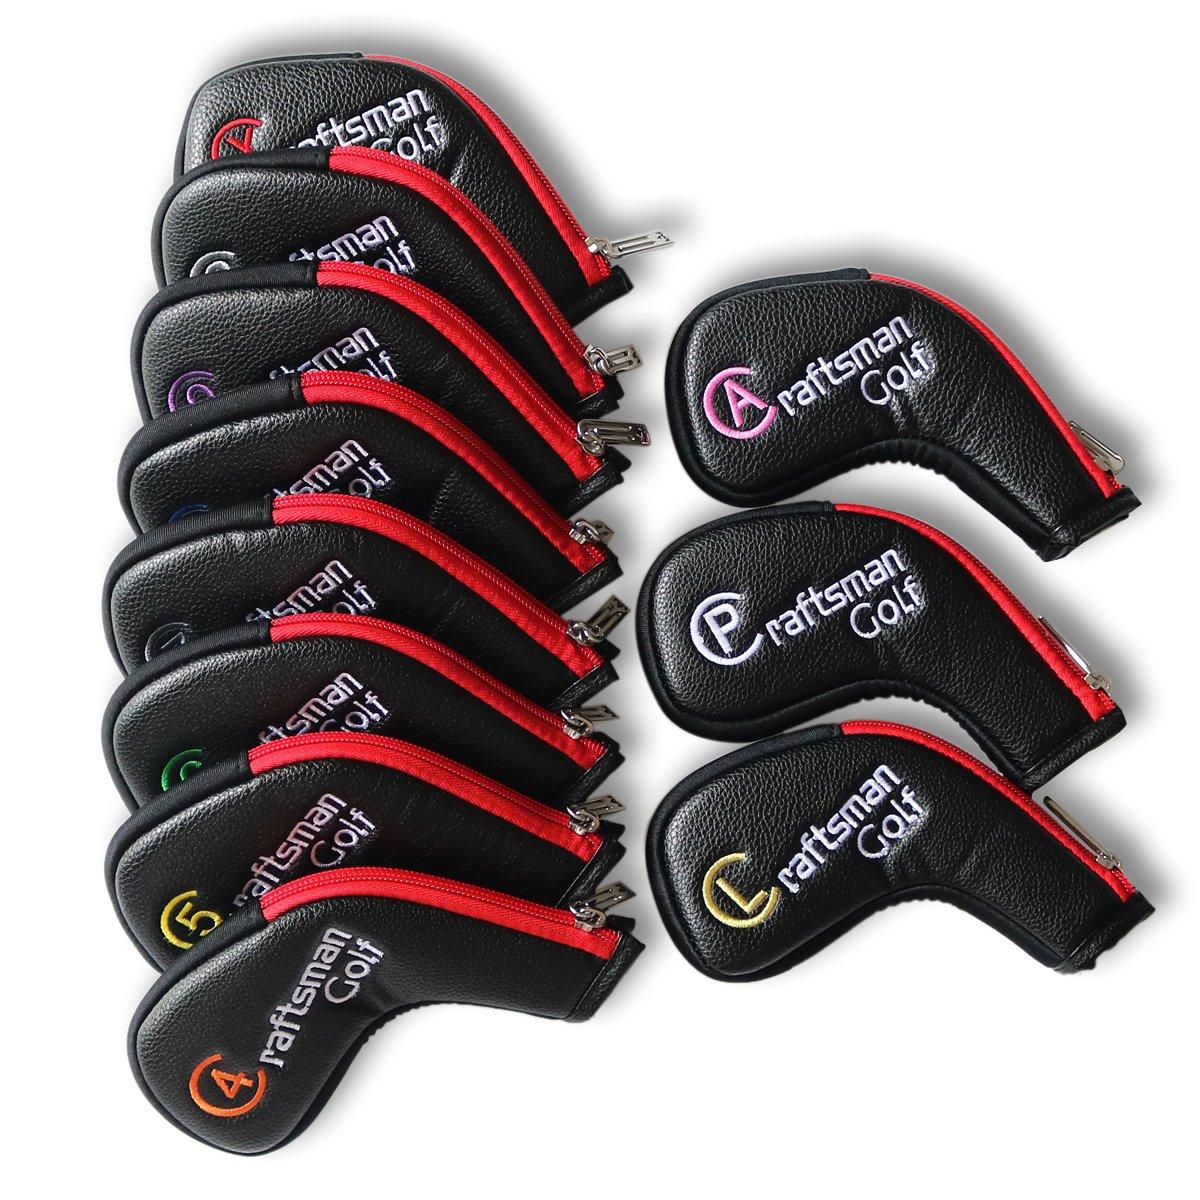 Artesano Golf 11pcs/set (diestros, a, S, P, L, x) (piel ...